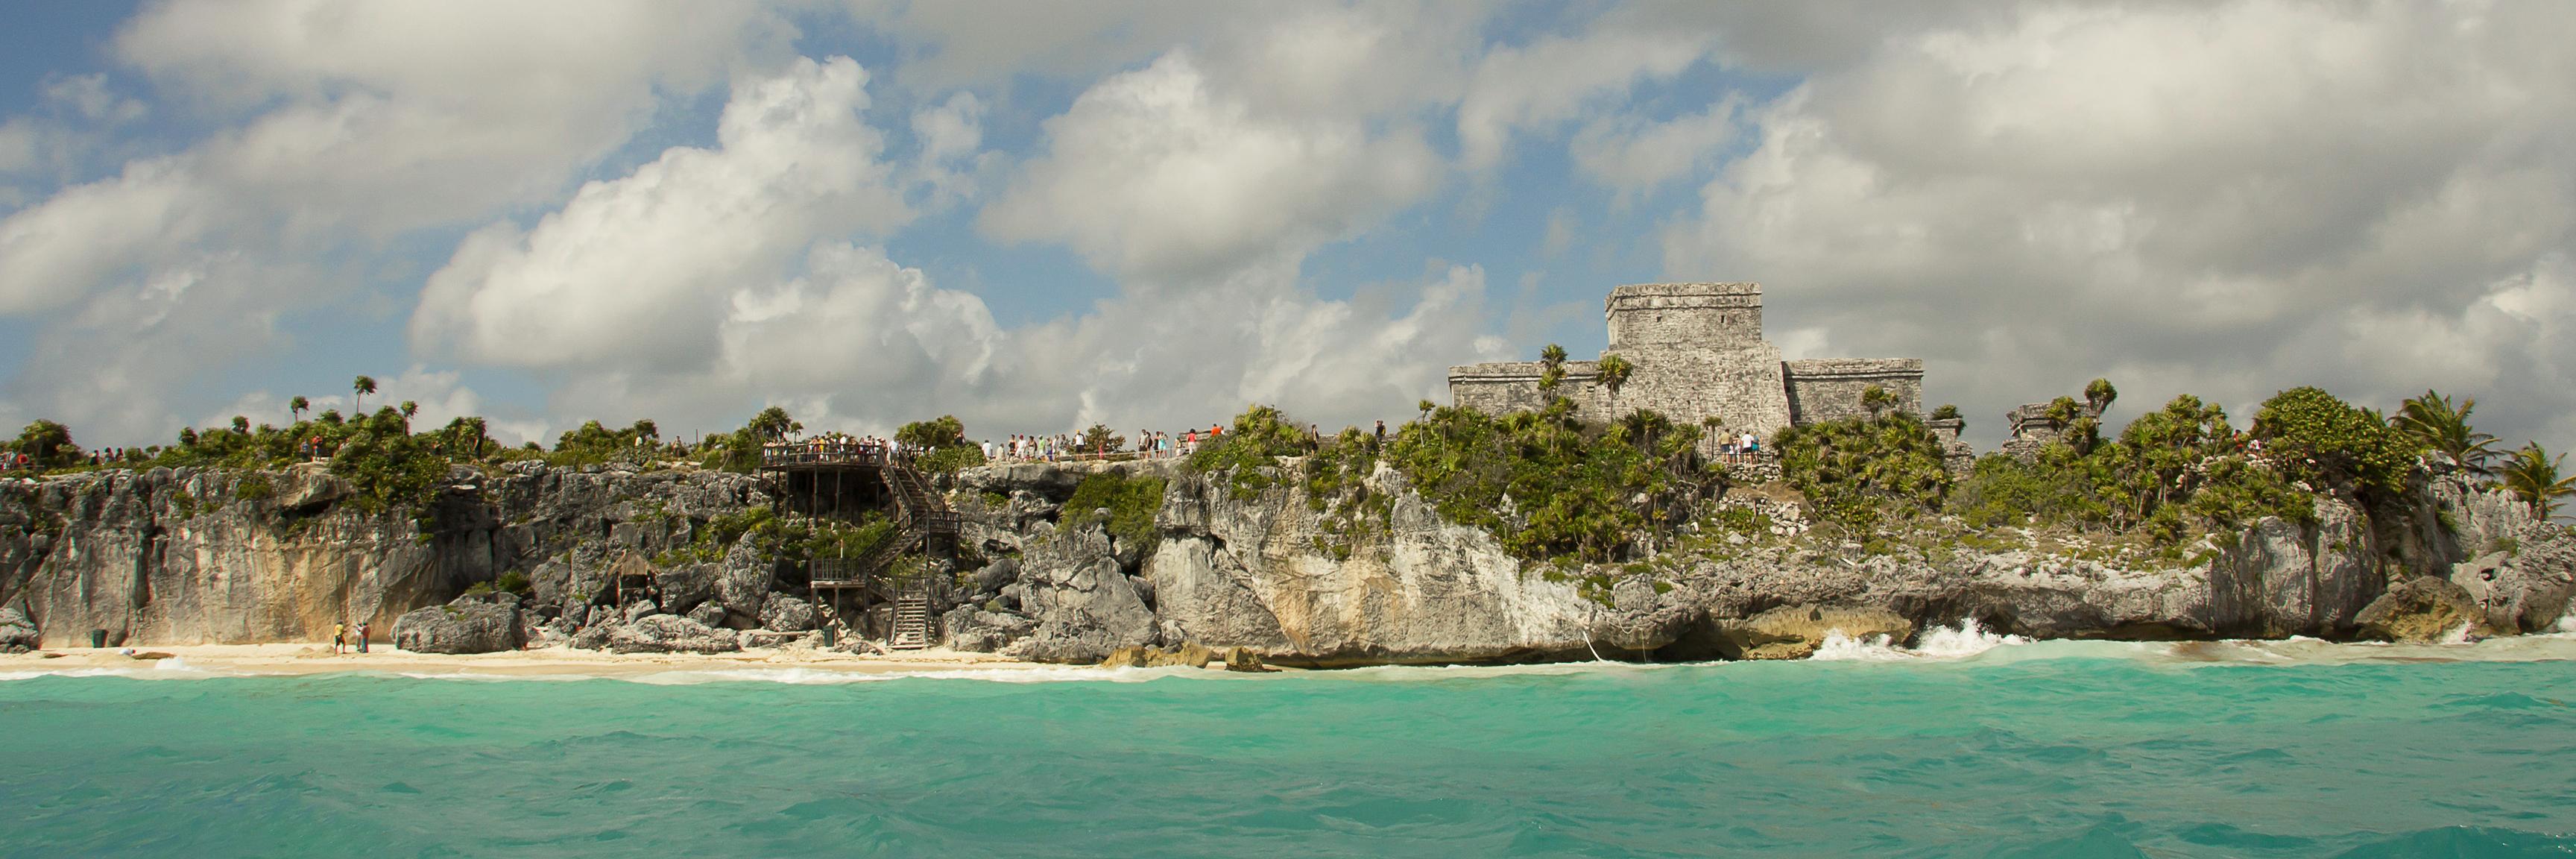 tulum-ruins-seaside-mexico-sina-falker